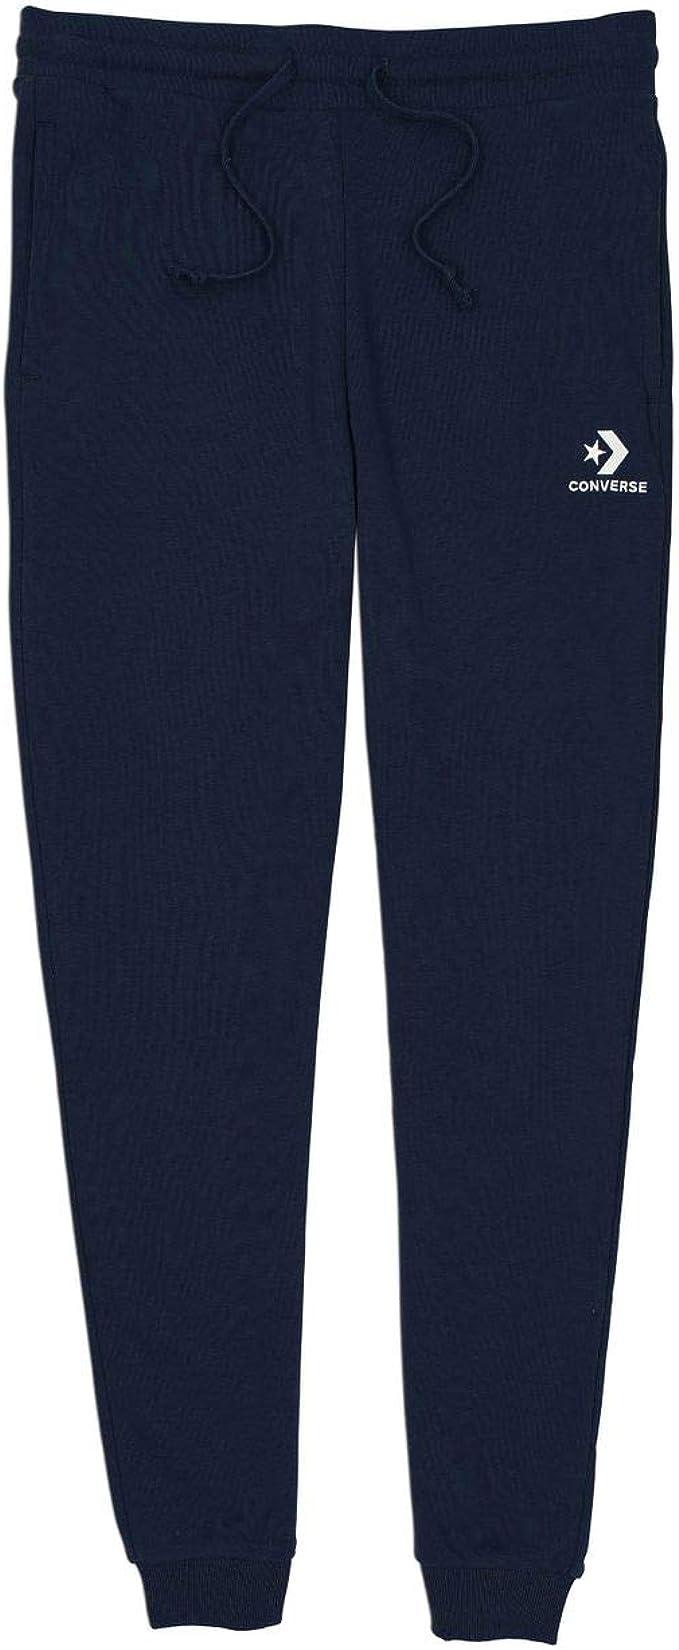 Converse 10008928 Pantaloni da uomo Star Chevron EMB, blu